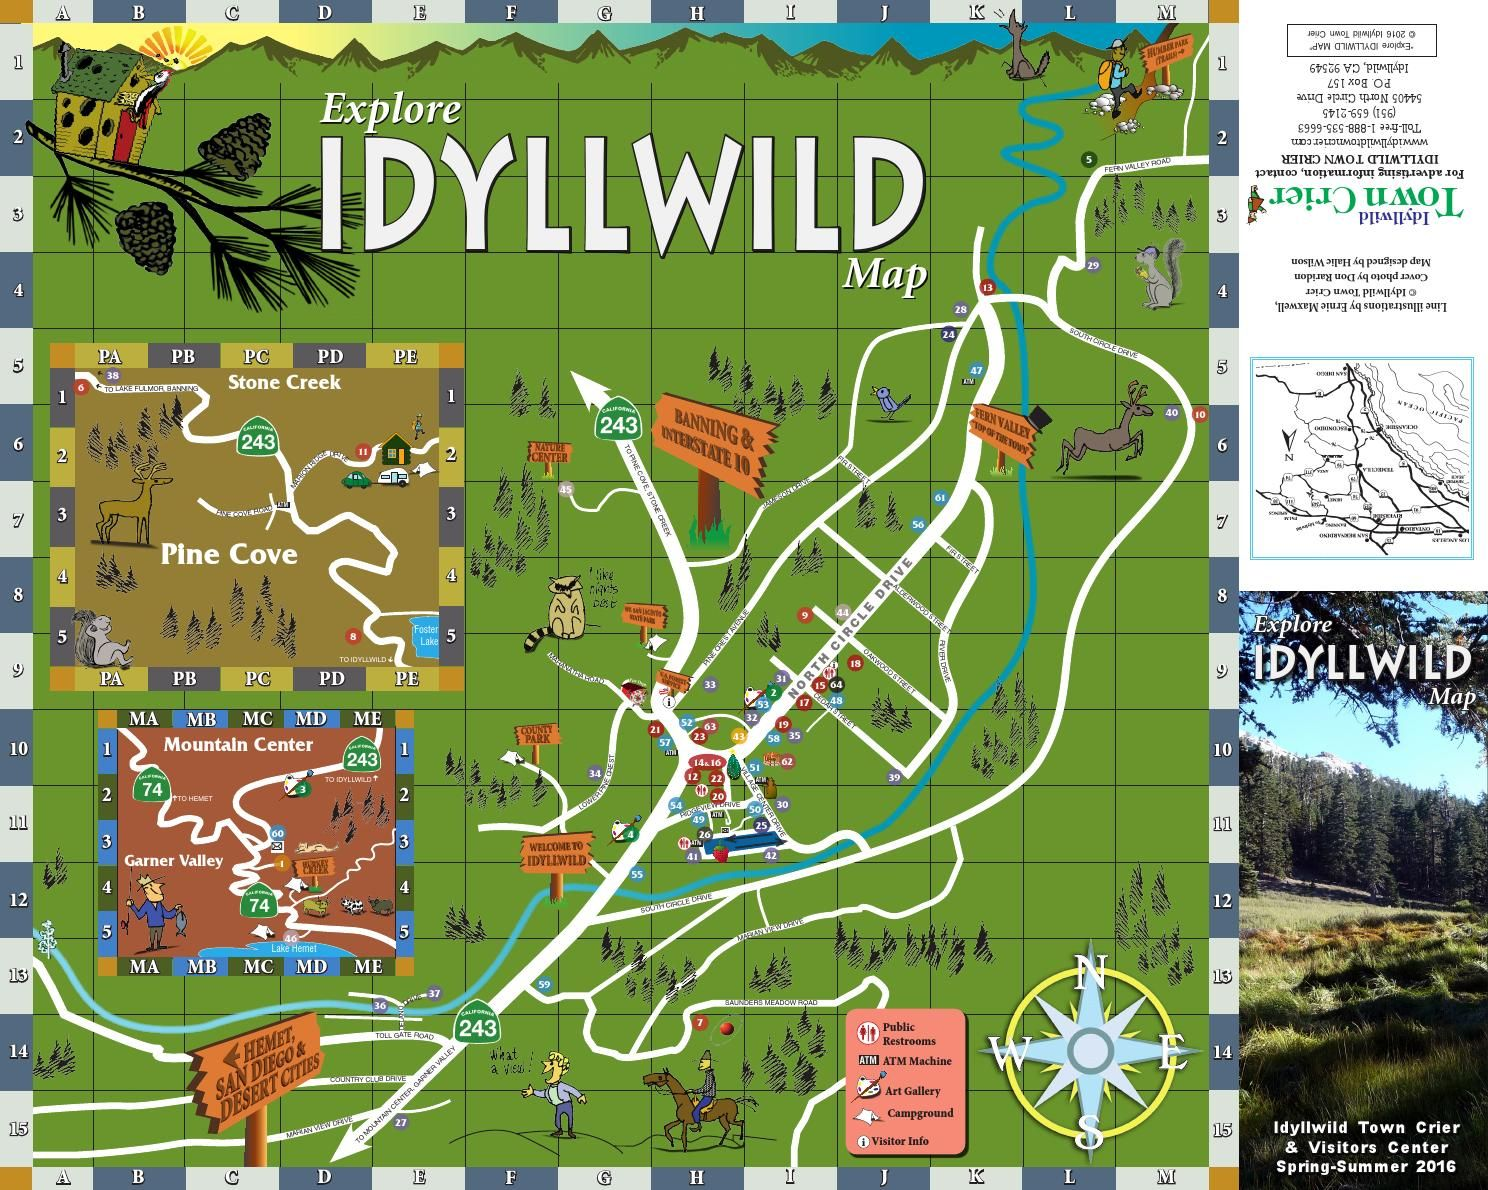 Explore Idyllwild Map 1 2016 Explore Idyllwild